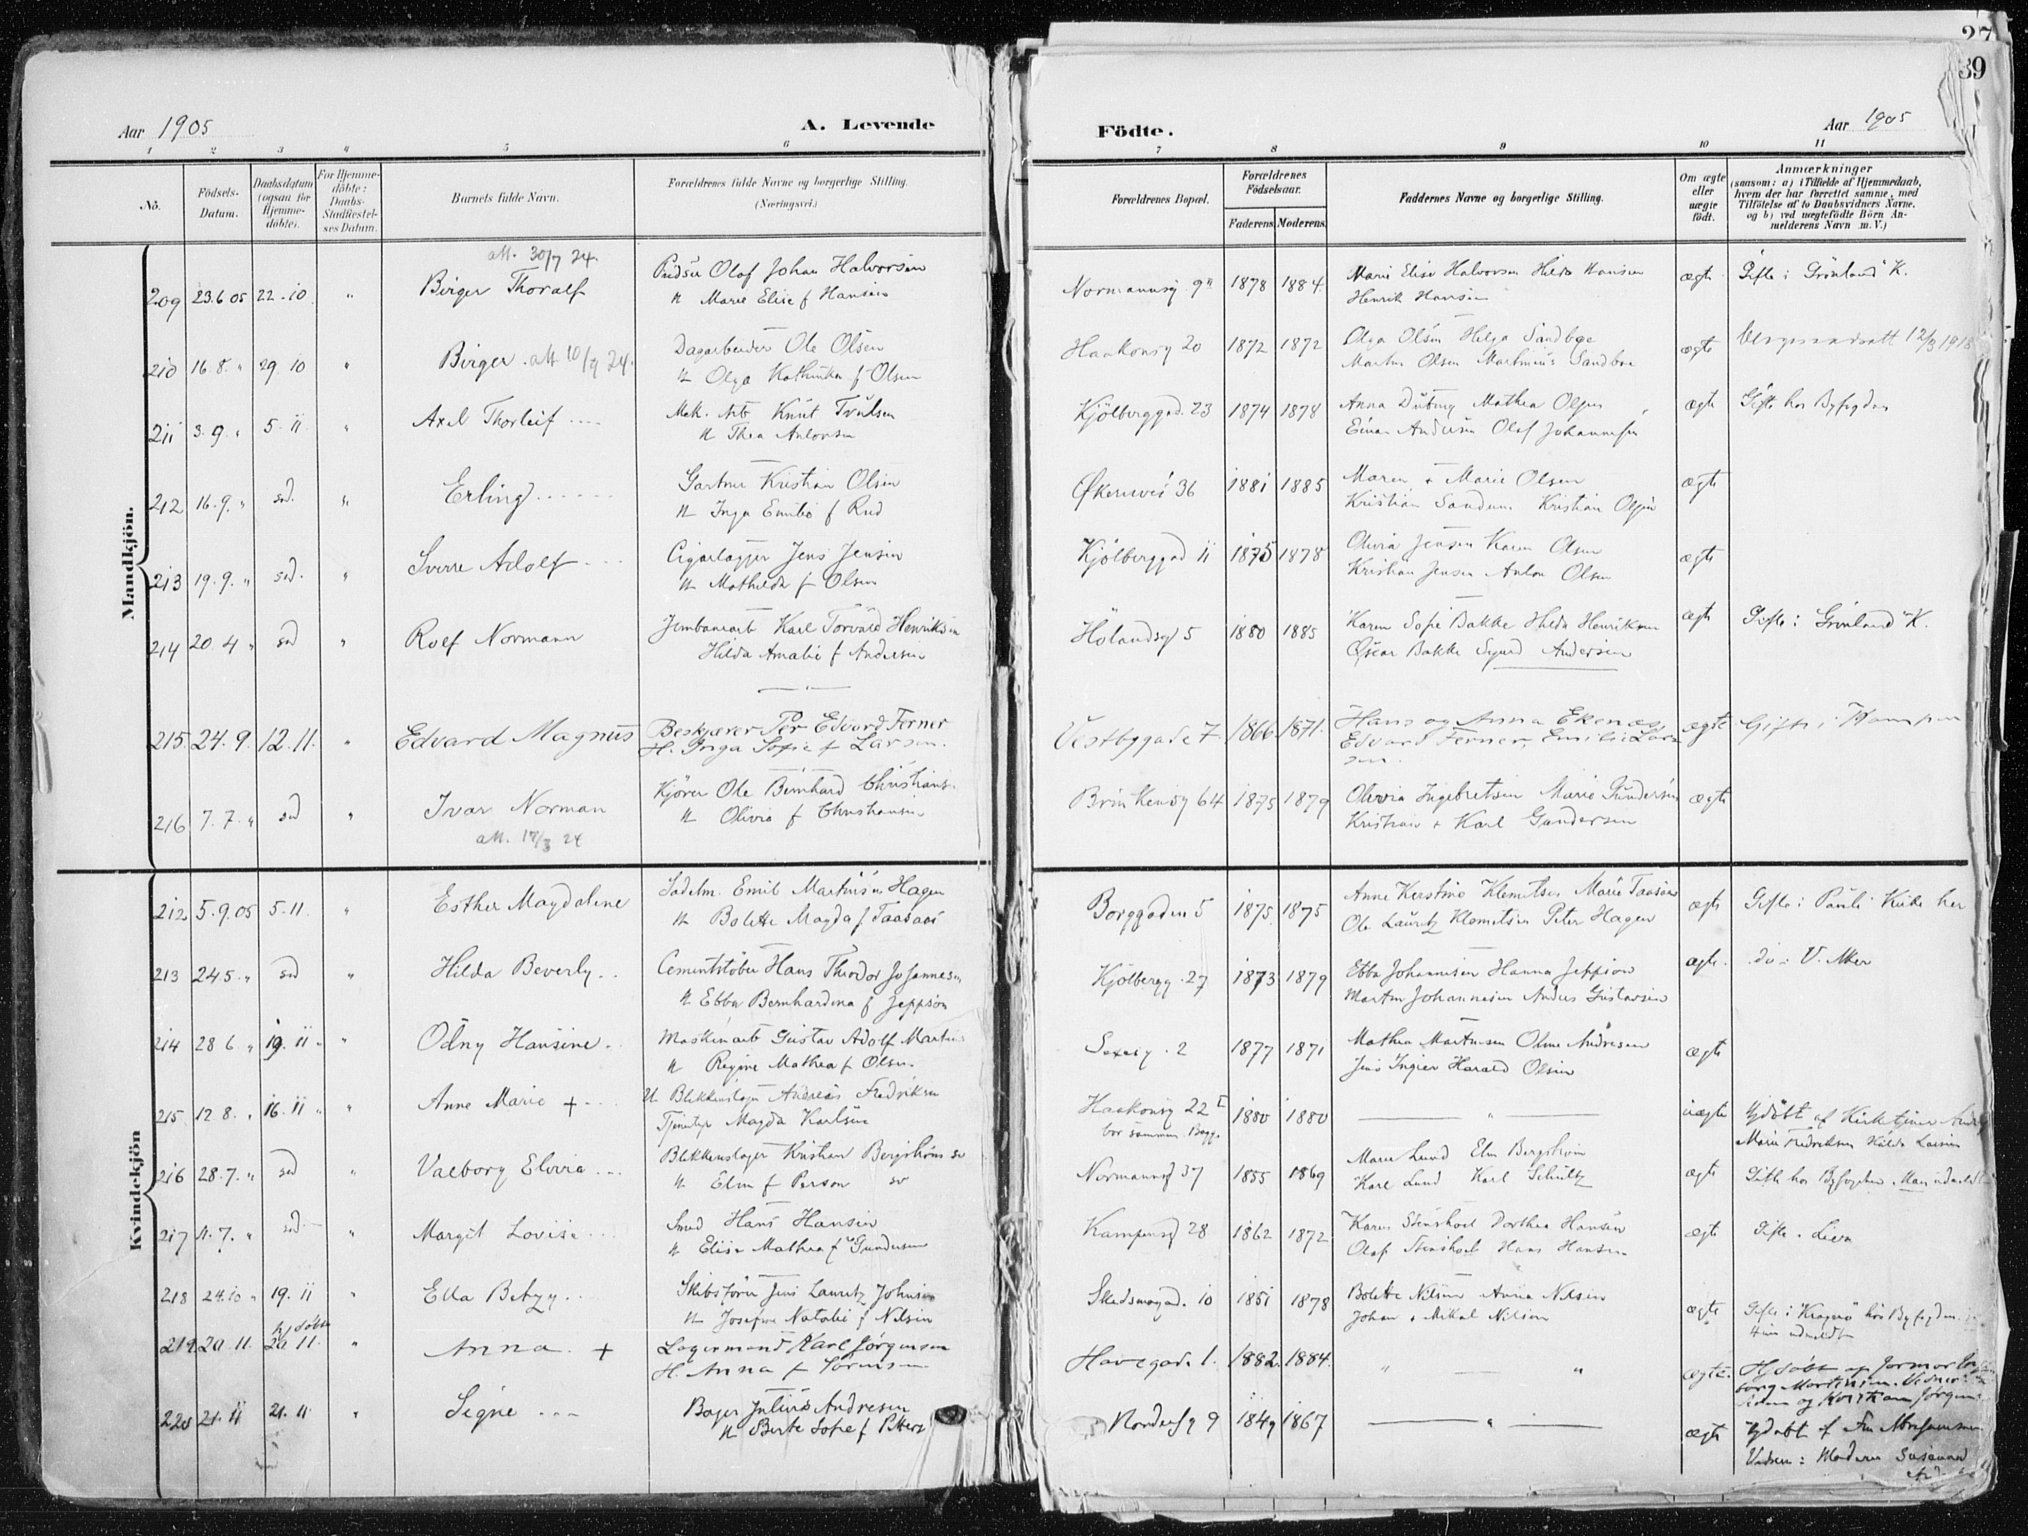 SAO, Kampen prestekontor Kirkebøker, F/Fa/L0010: Ministerialbok nr. I 10, 1905-1917, s. 1